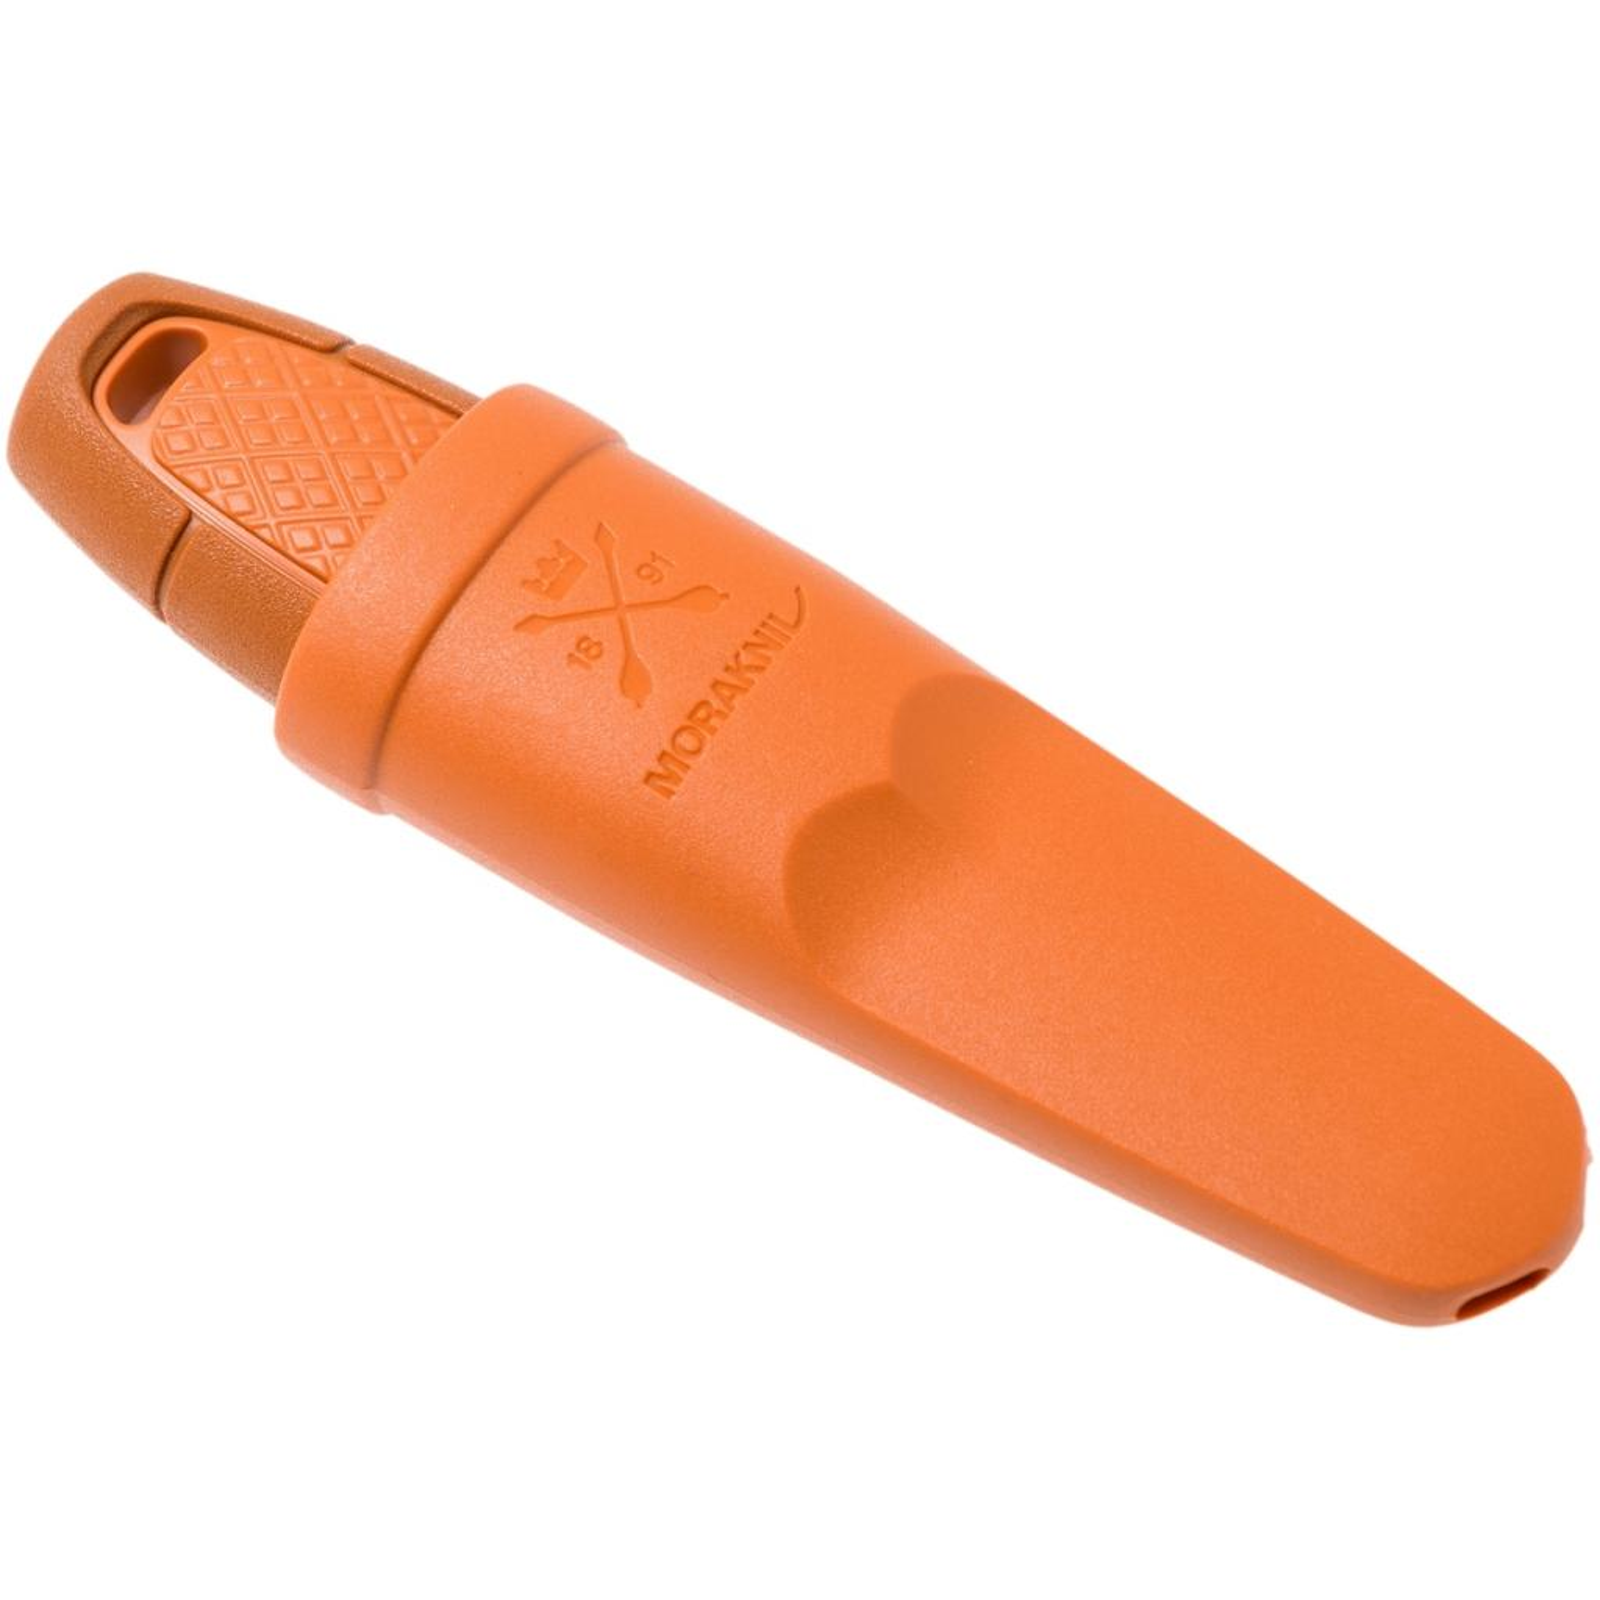 Нож Morakniv Eldris Orange (13501) изображение 5